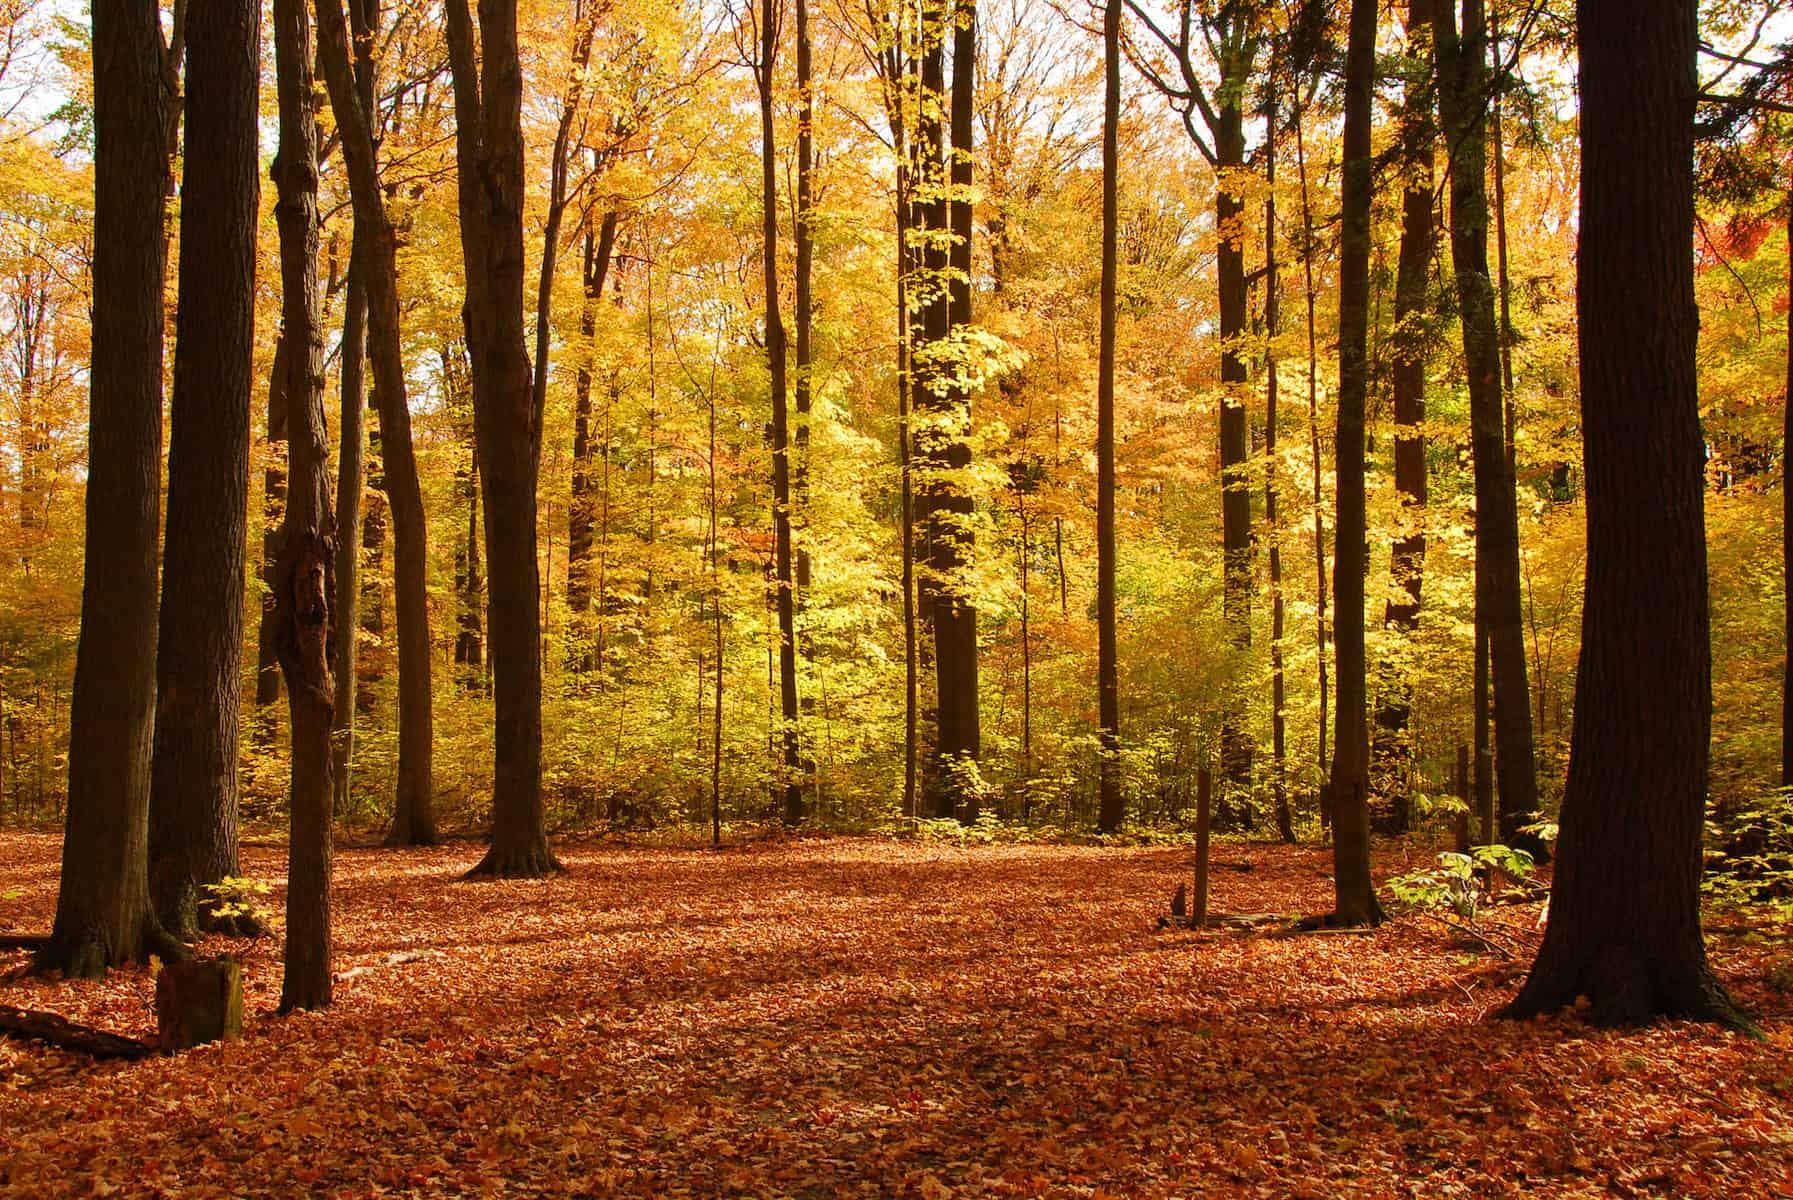 Timber Buyer - Logging Company